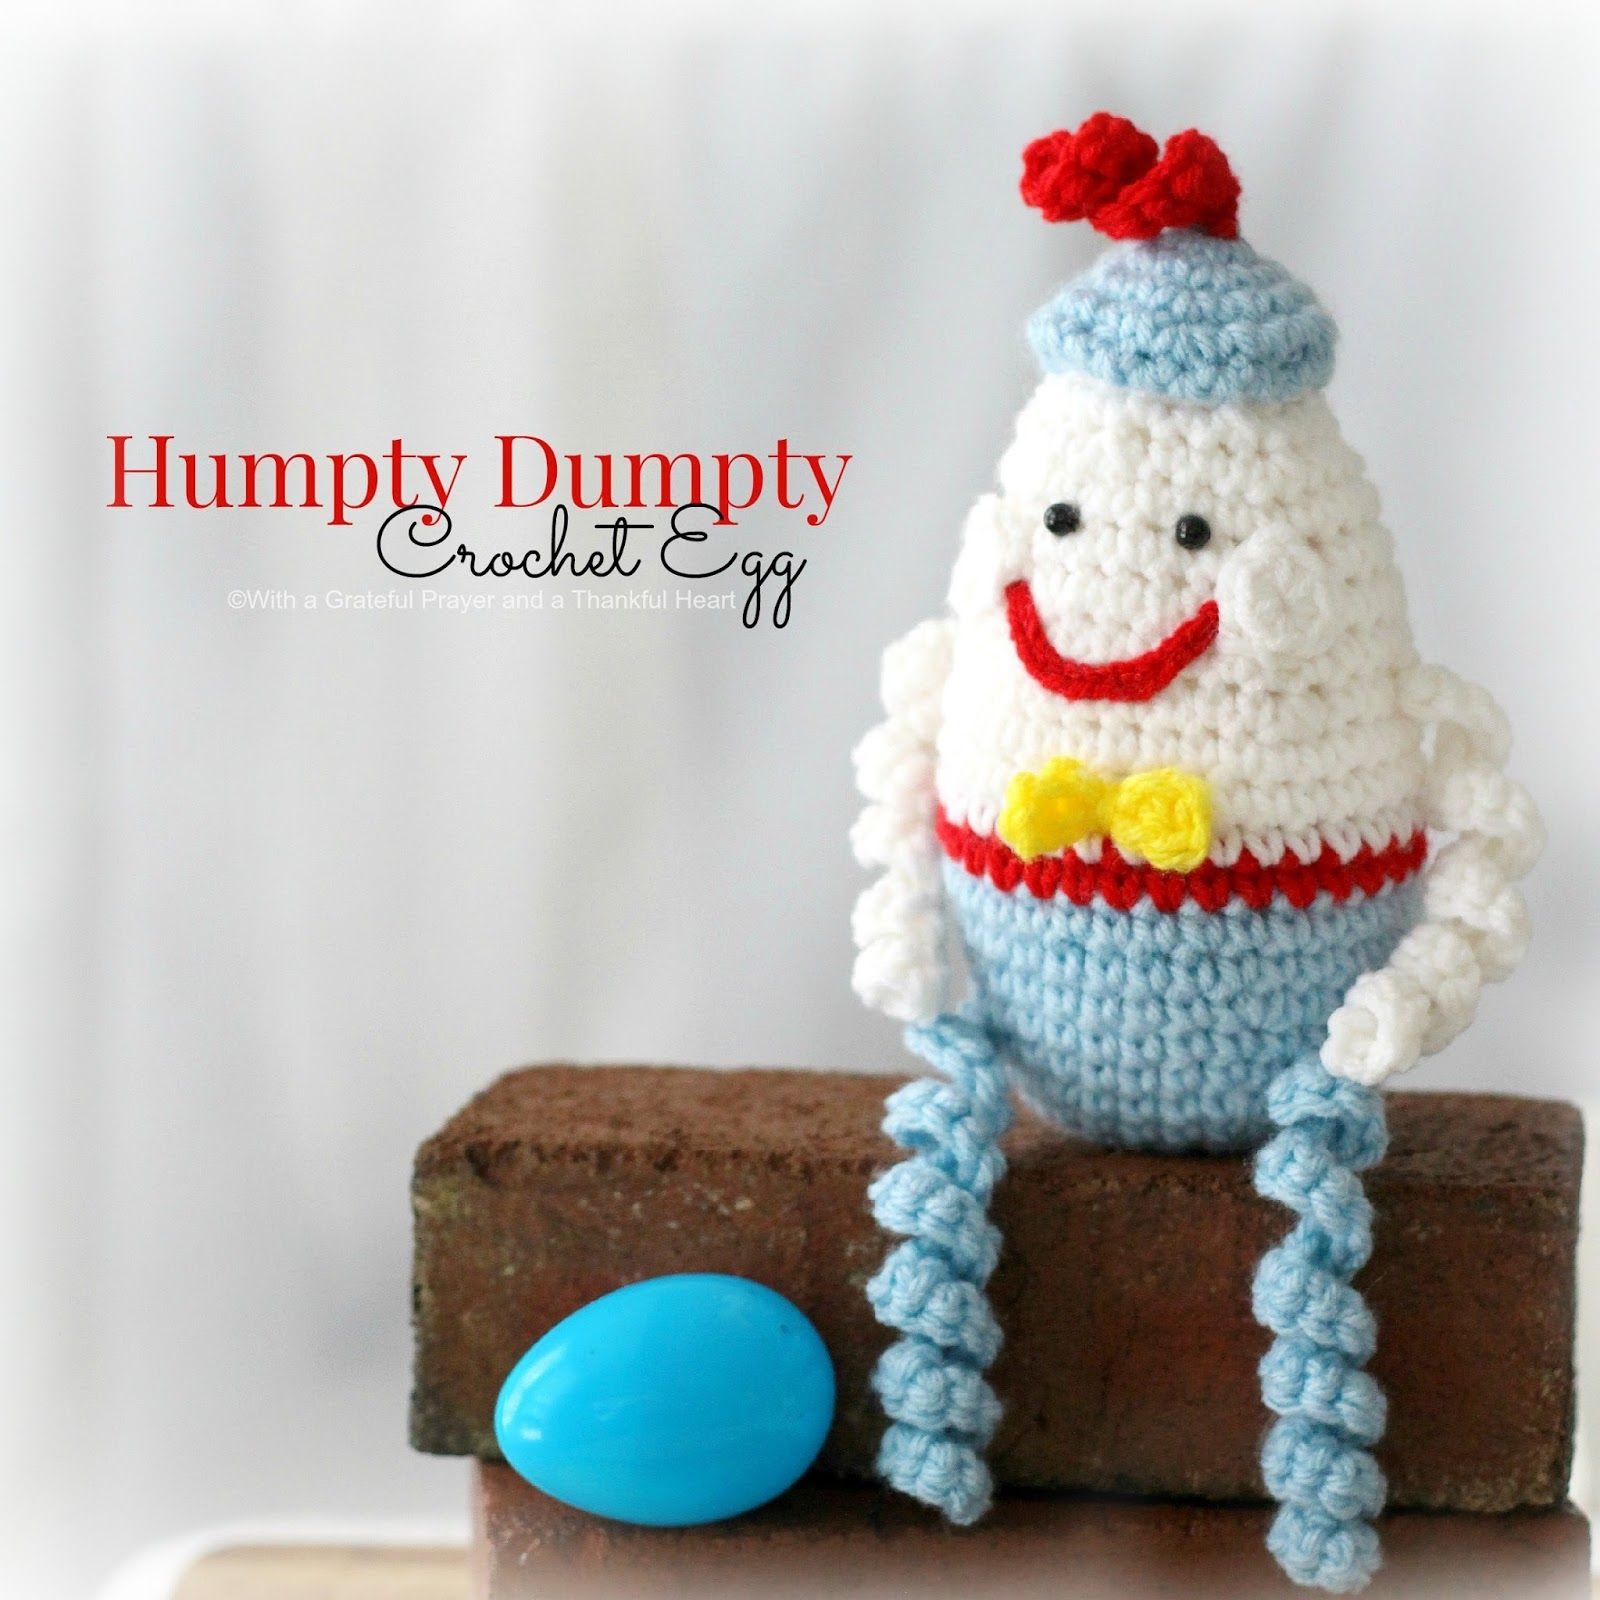 Crochet Humpty Dumpty Egg